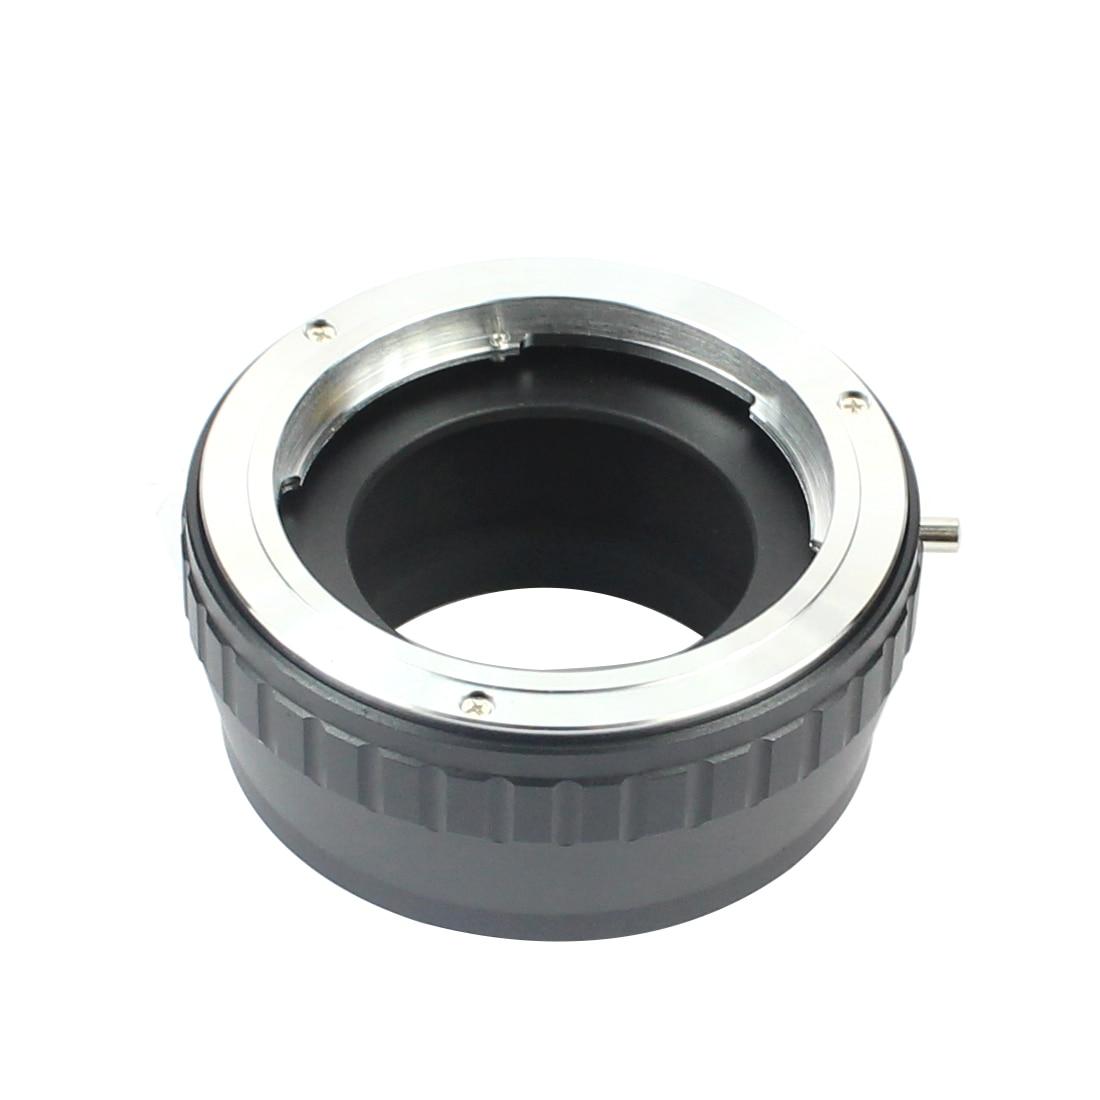 Para Rollei Rolleiflex 6000 6003 6008 Correa de Cuello Cámara Fotógrafo